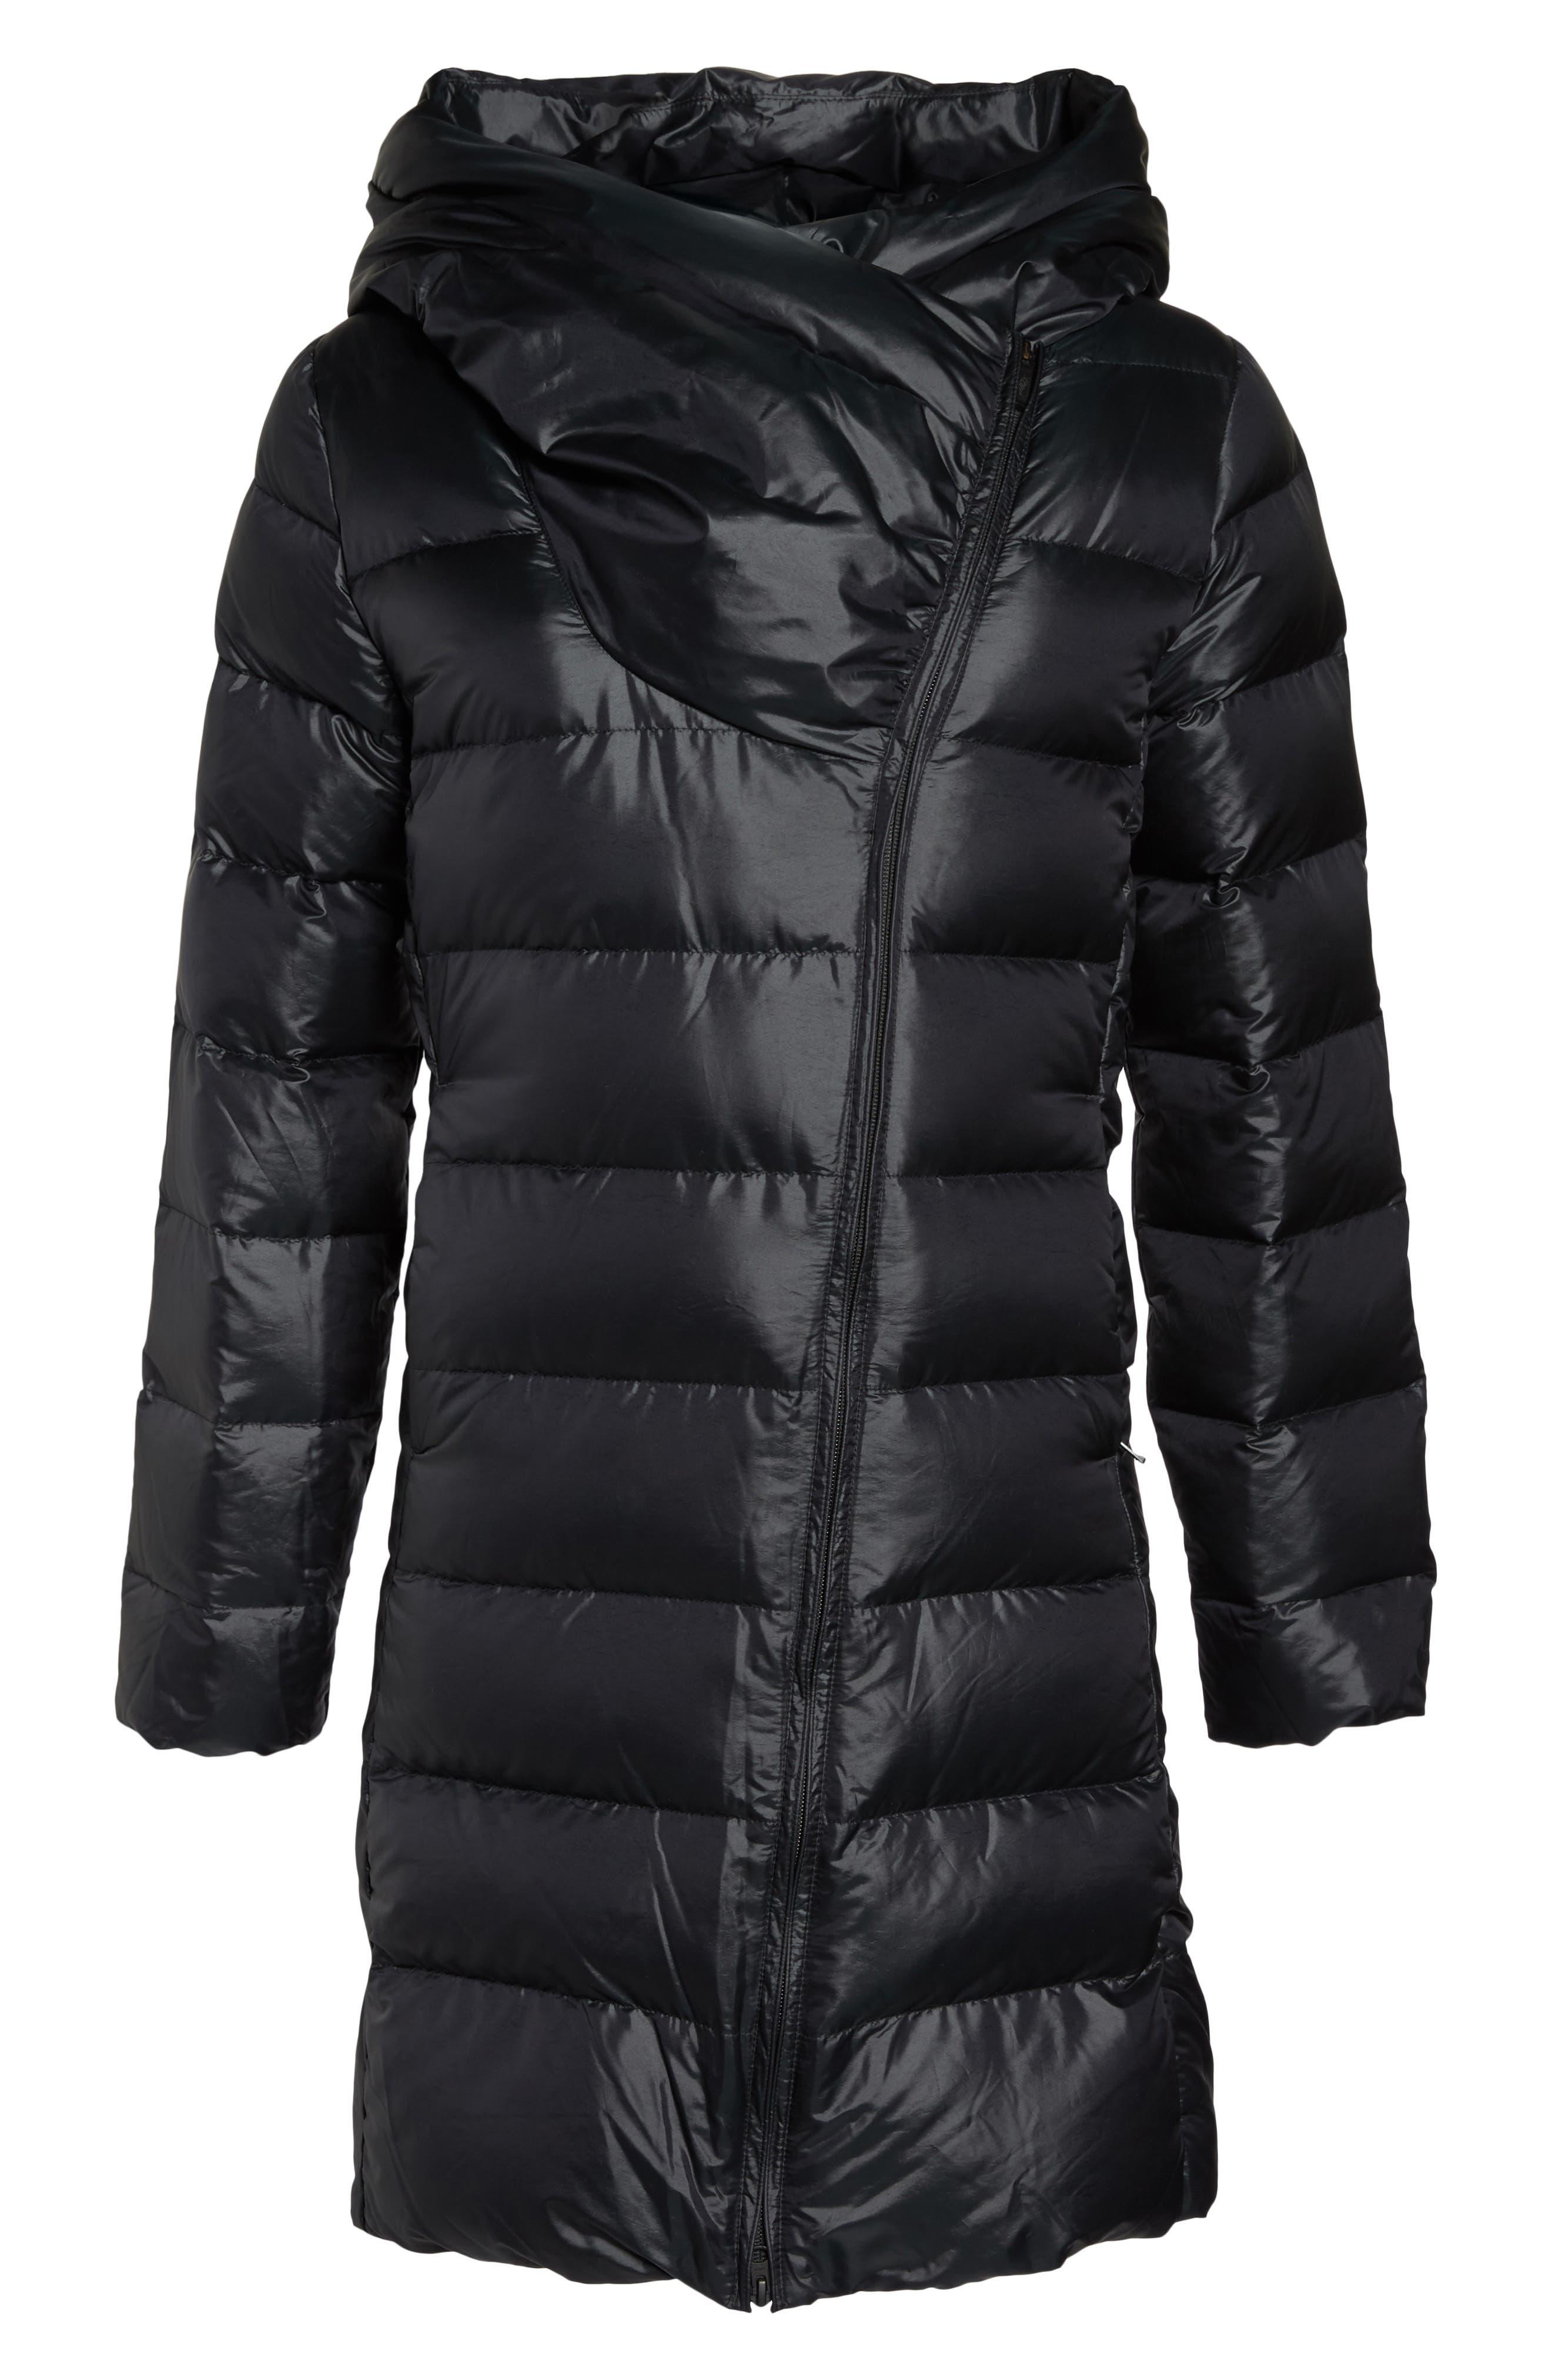 Sportswear Women's Down Parka,                             Alternate thumbnail 6, color,                             Black/ Black/ Black